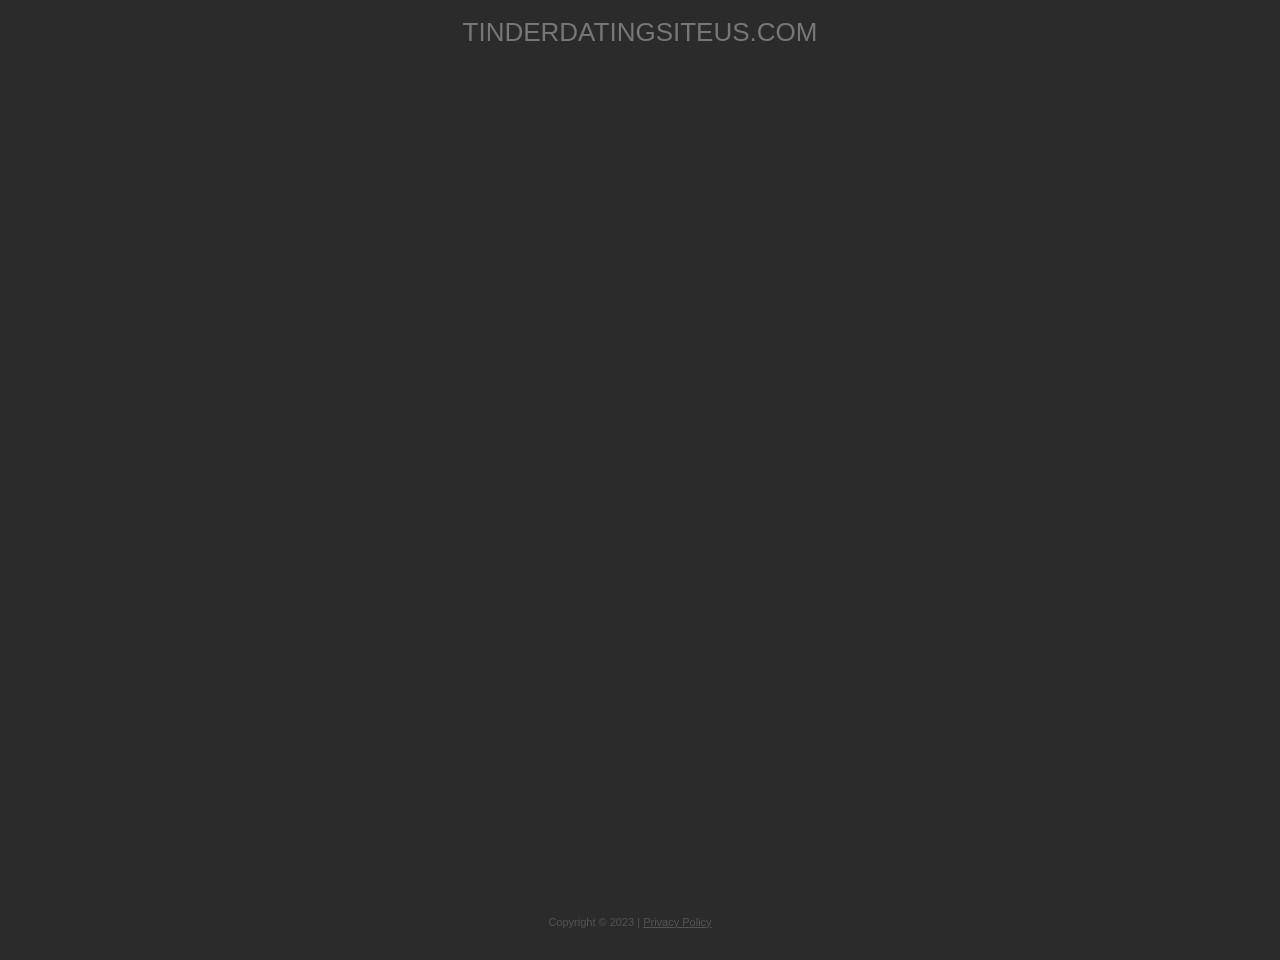 Blmyo online dating